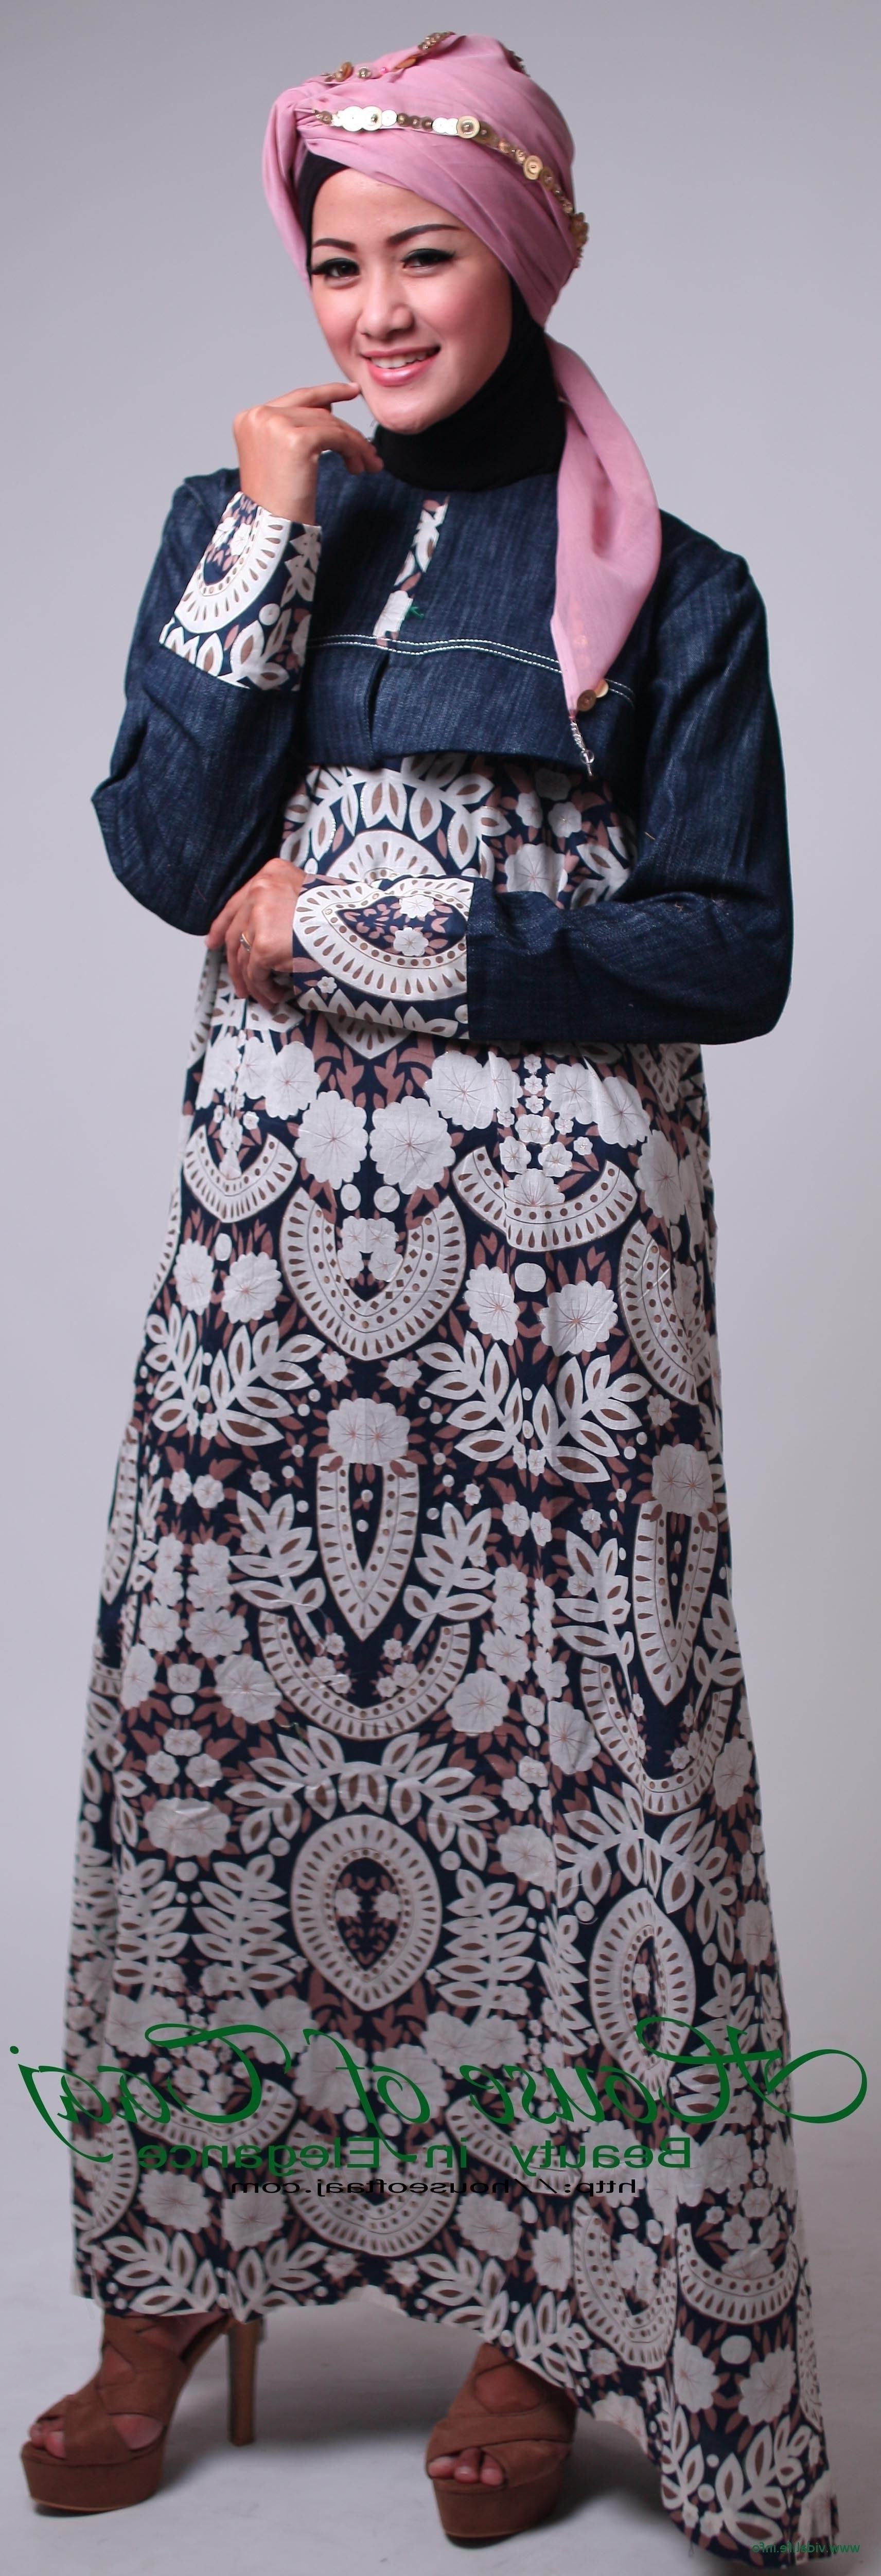 Design Baju Gaun Pengantin Muslim H9d9 Gaun Pengantin Muslimah Bagus Jual Mainboard W210cumb 0d